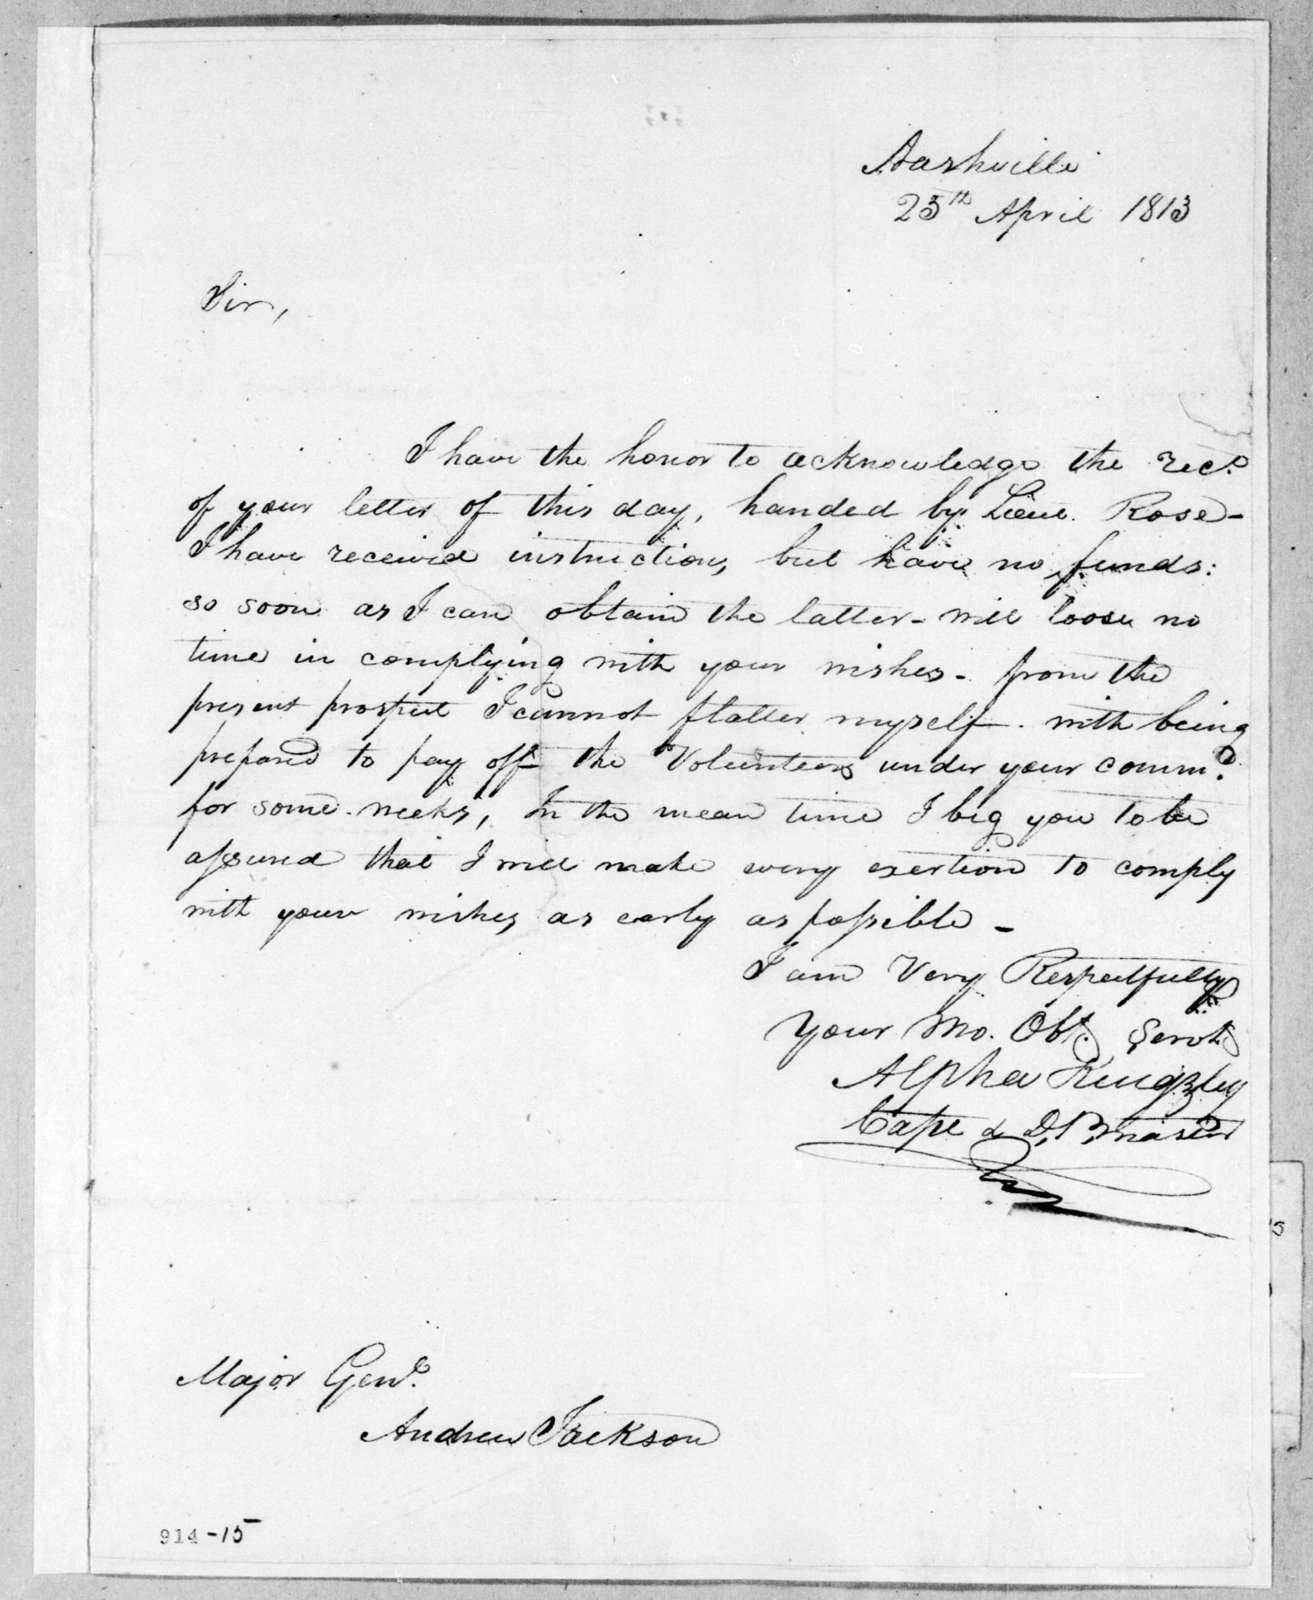 Alpha Kingsley to Andrew Jackson, April 25, 1813